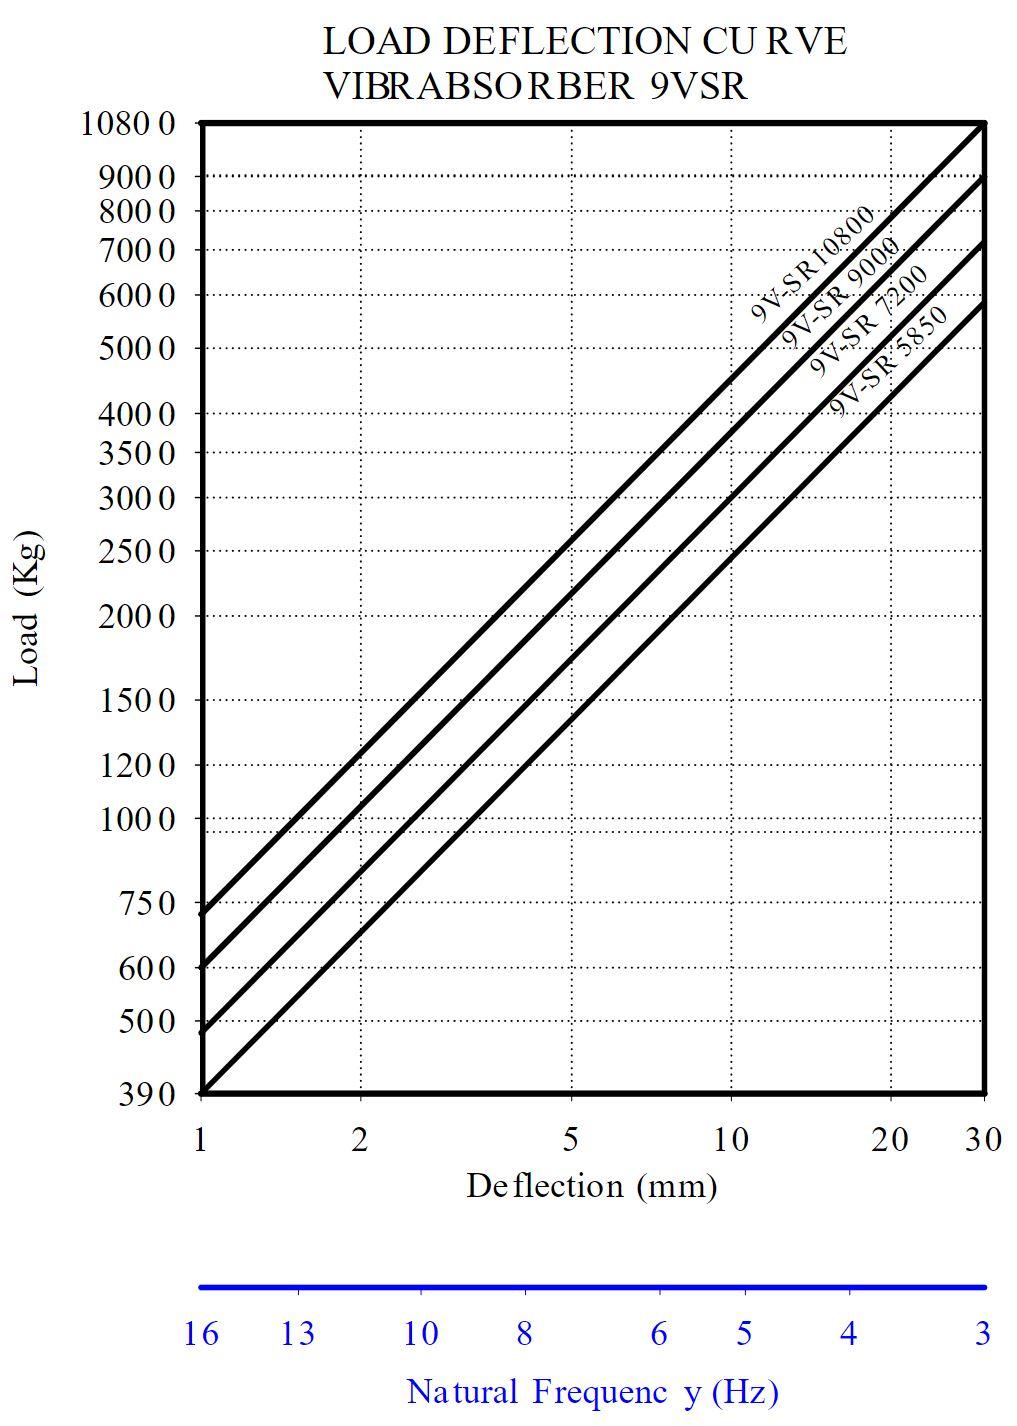 9-VSR curve